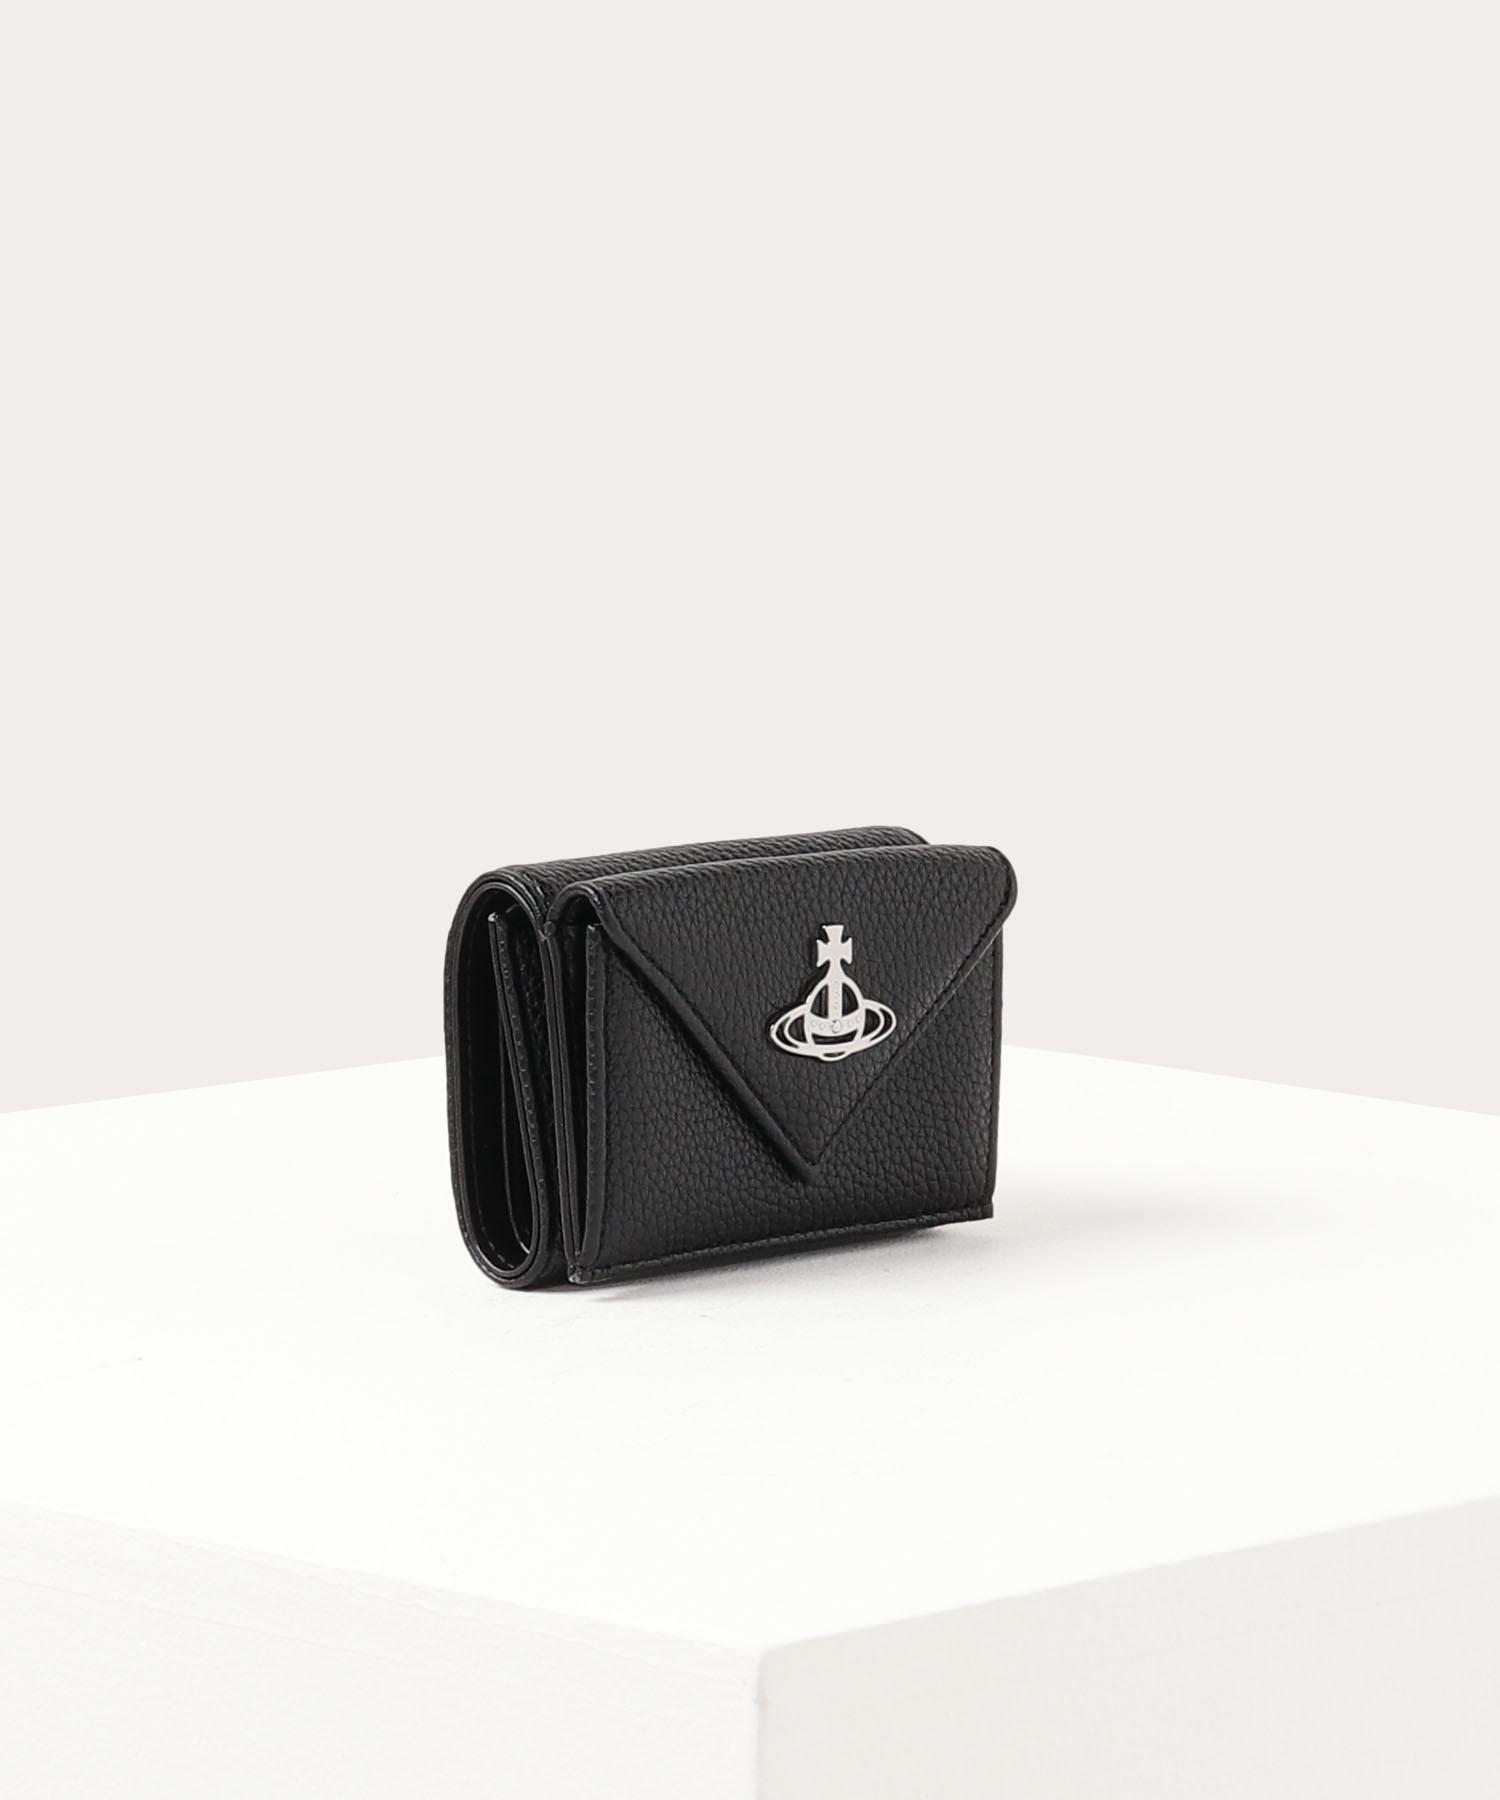 JOHANNA 三つ折りミニ財布